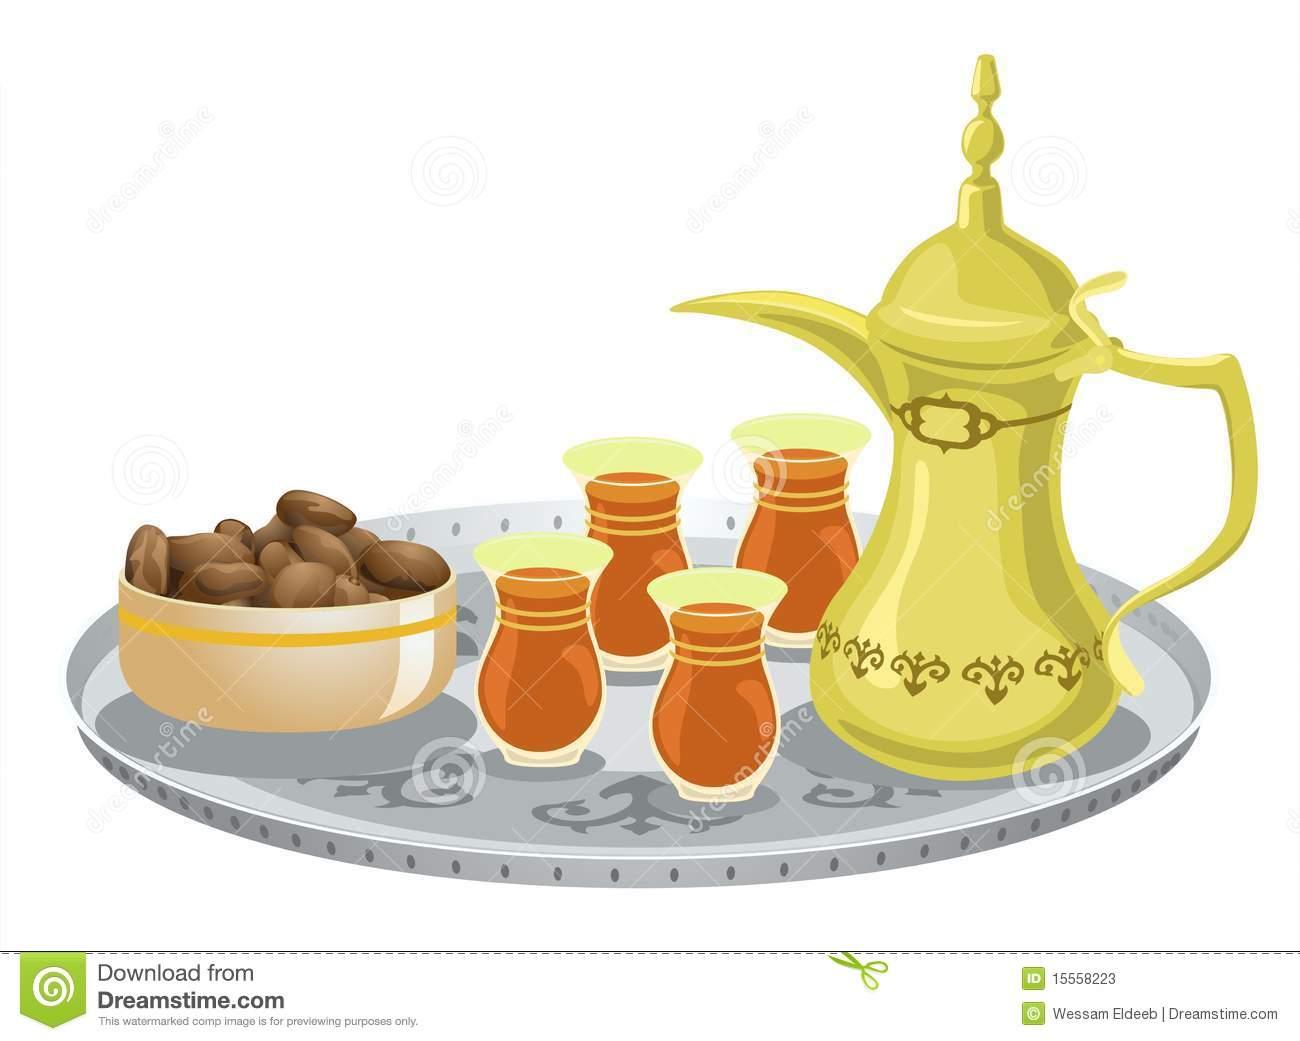 Arab clipart tea Food tea With collection Arabian